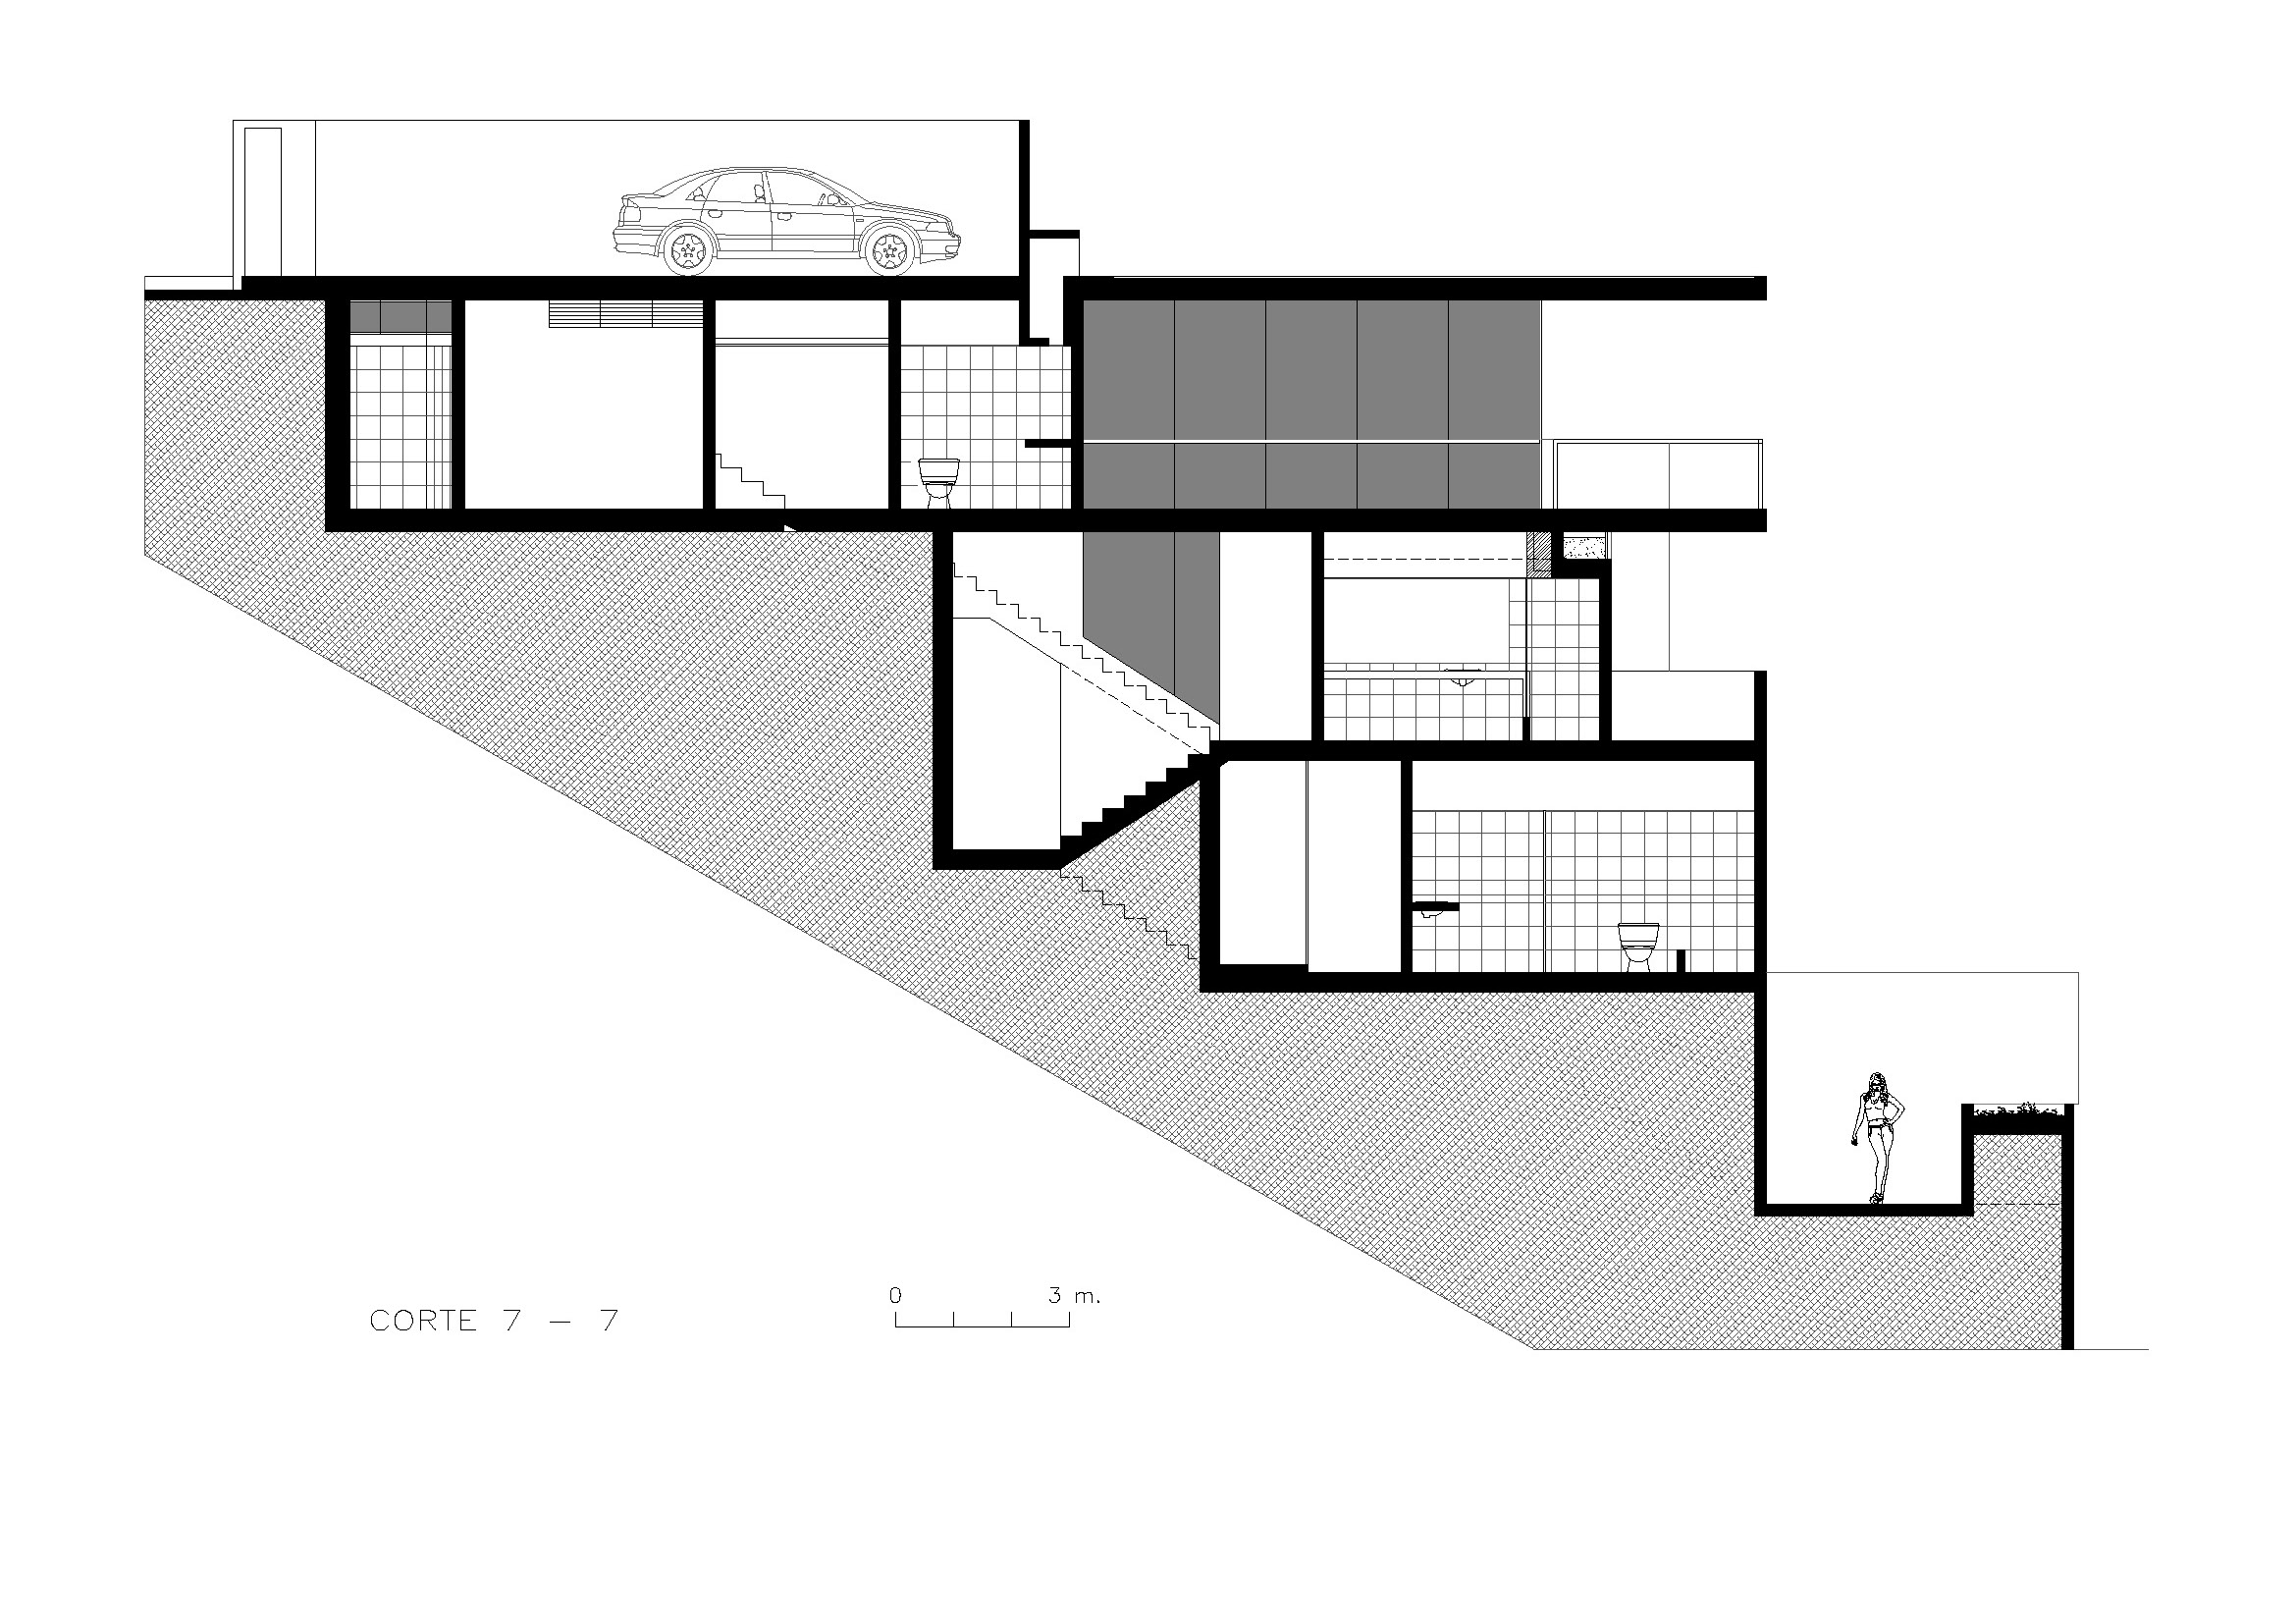 Revista De Arquitectura Y Dise O Peruarki Casa Del